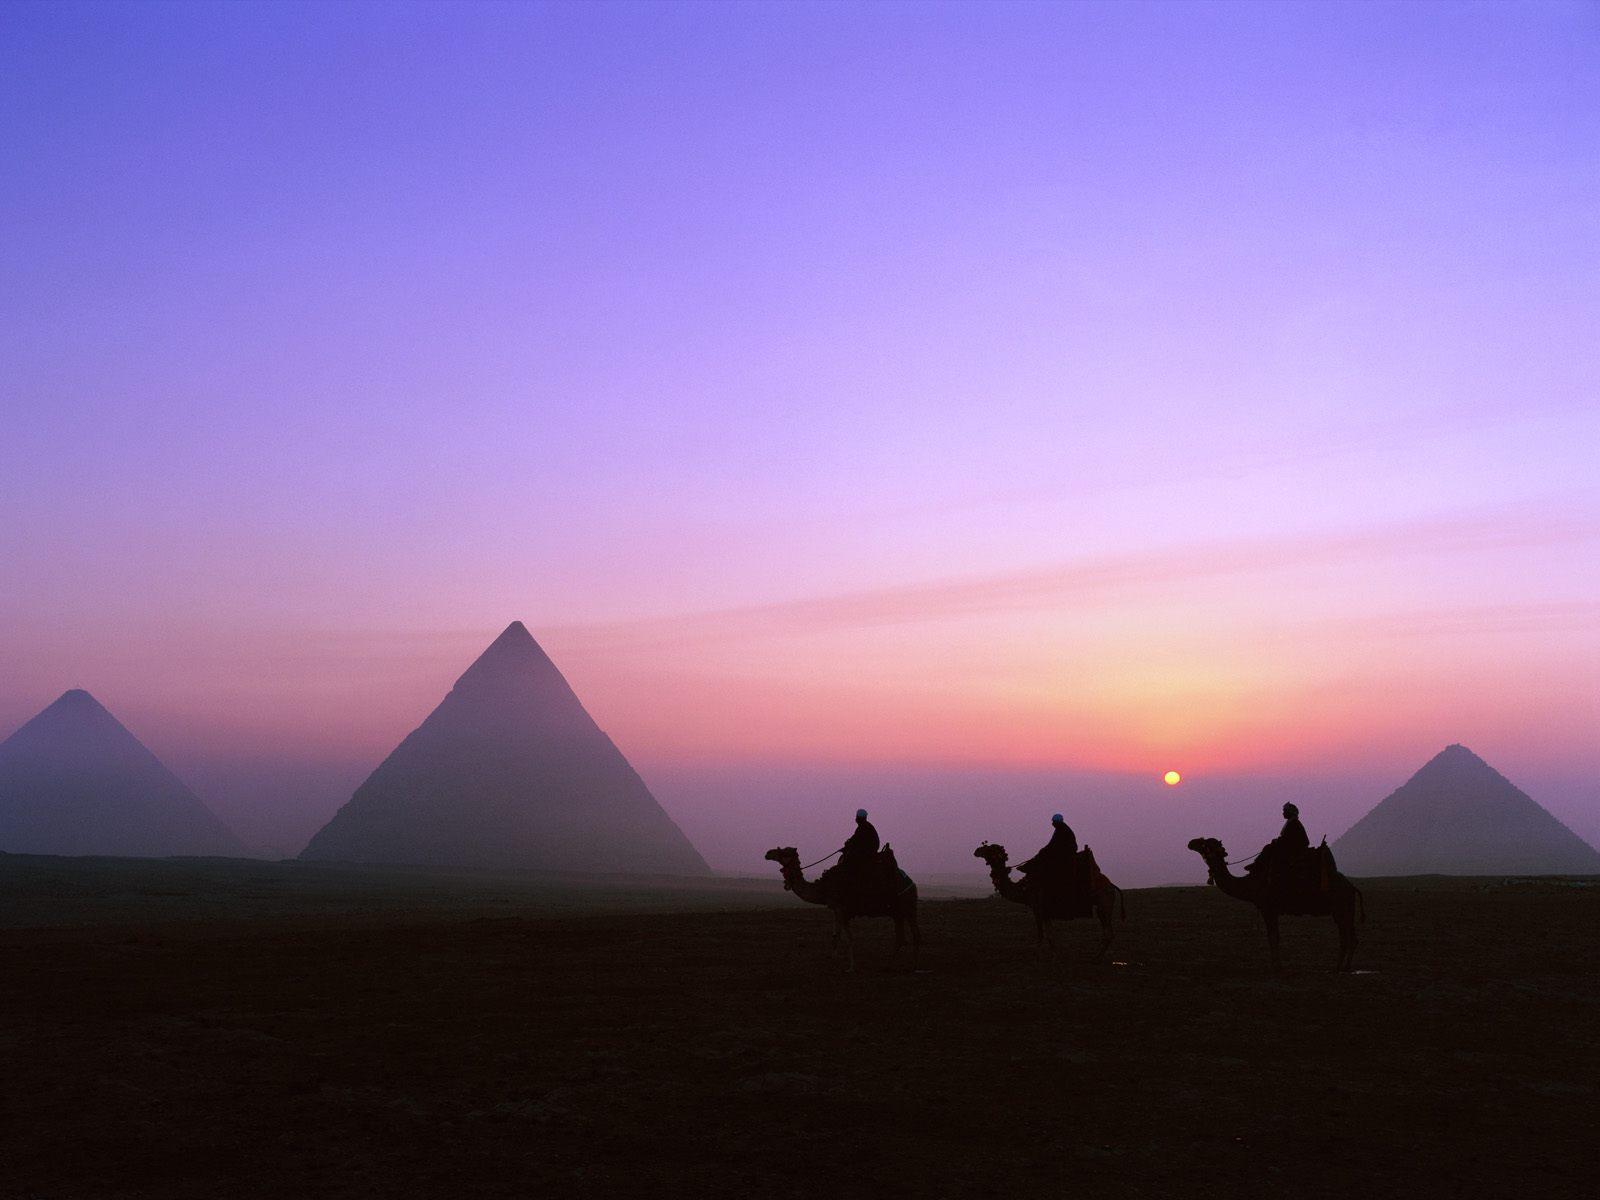 Great Pyramid of Giza   The Pyramid of Cheops Khufu 1600x1200